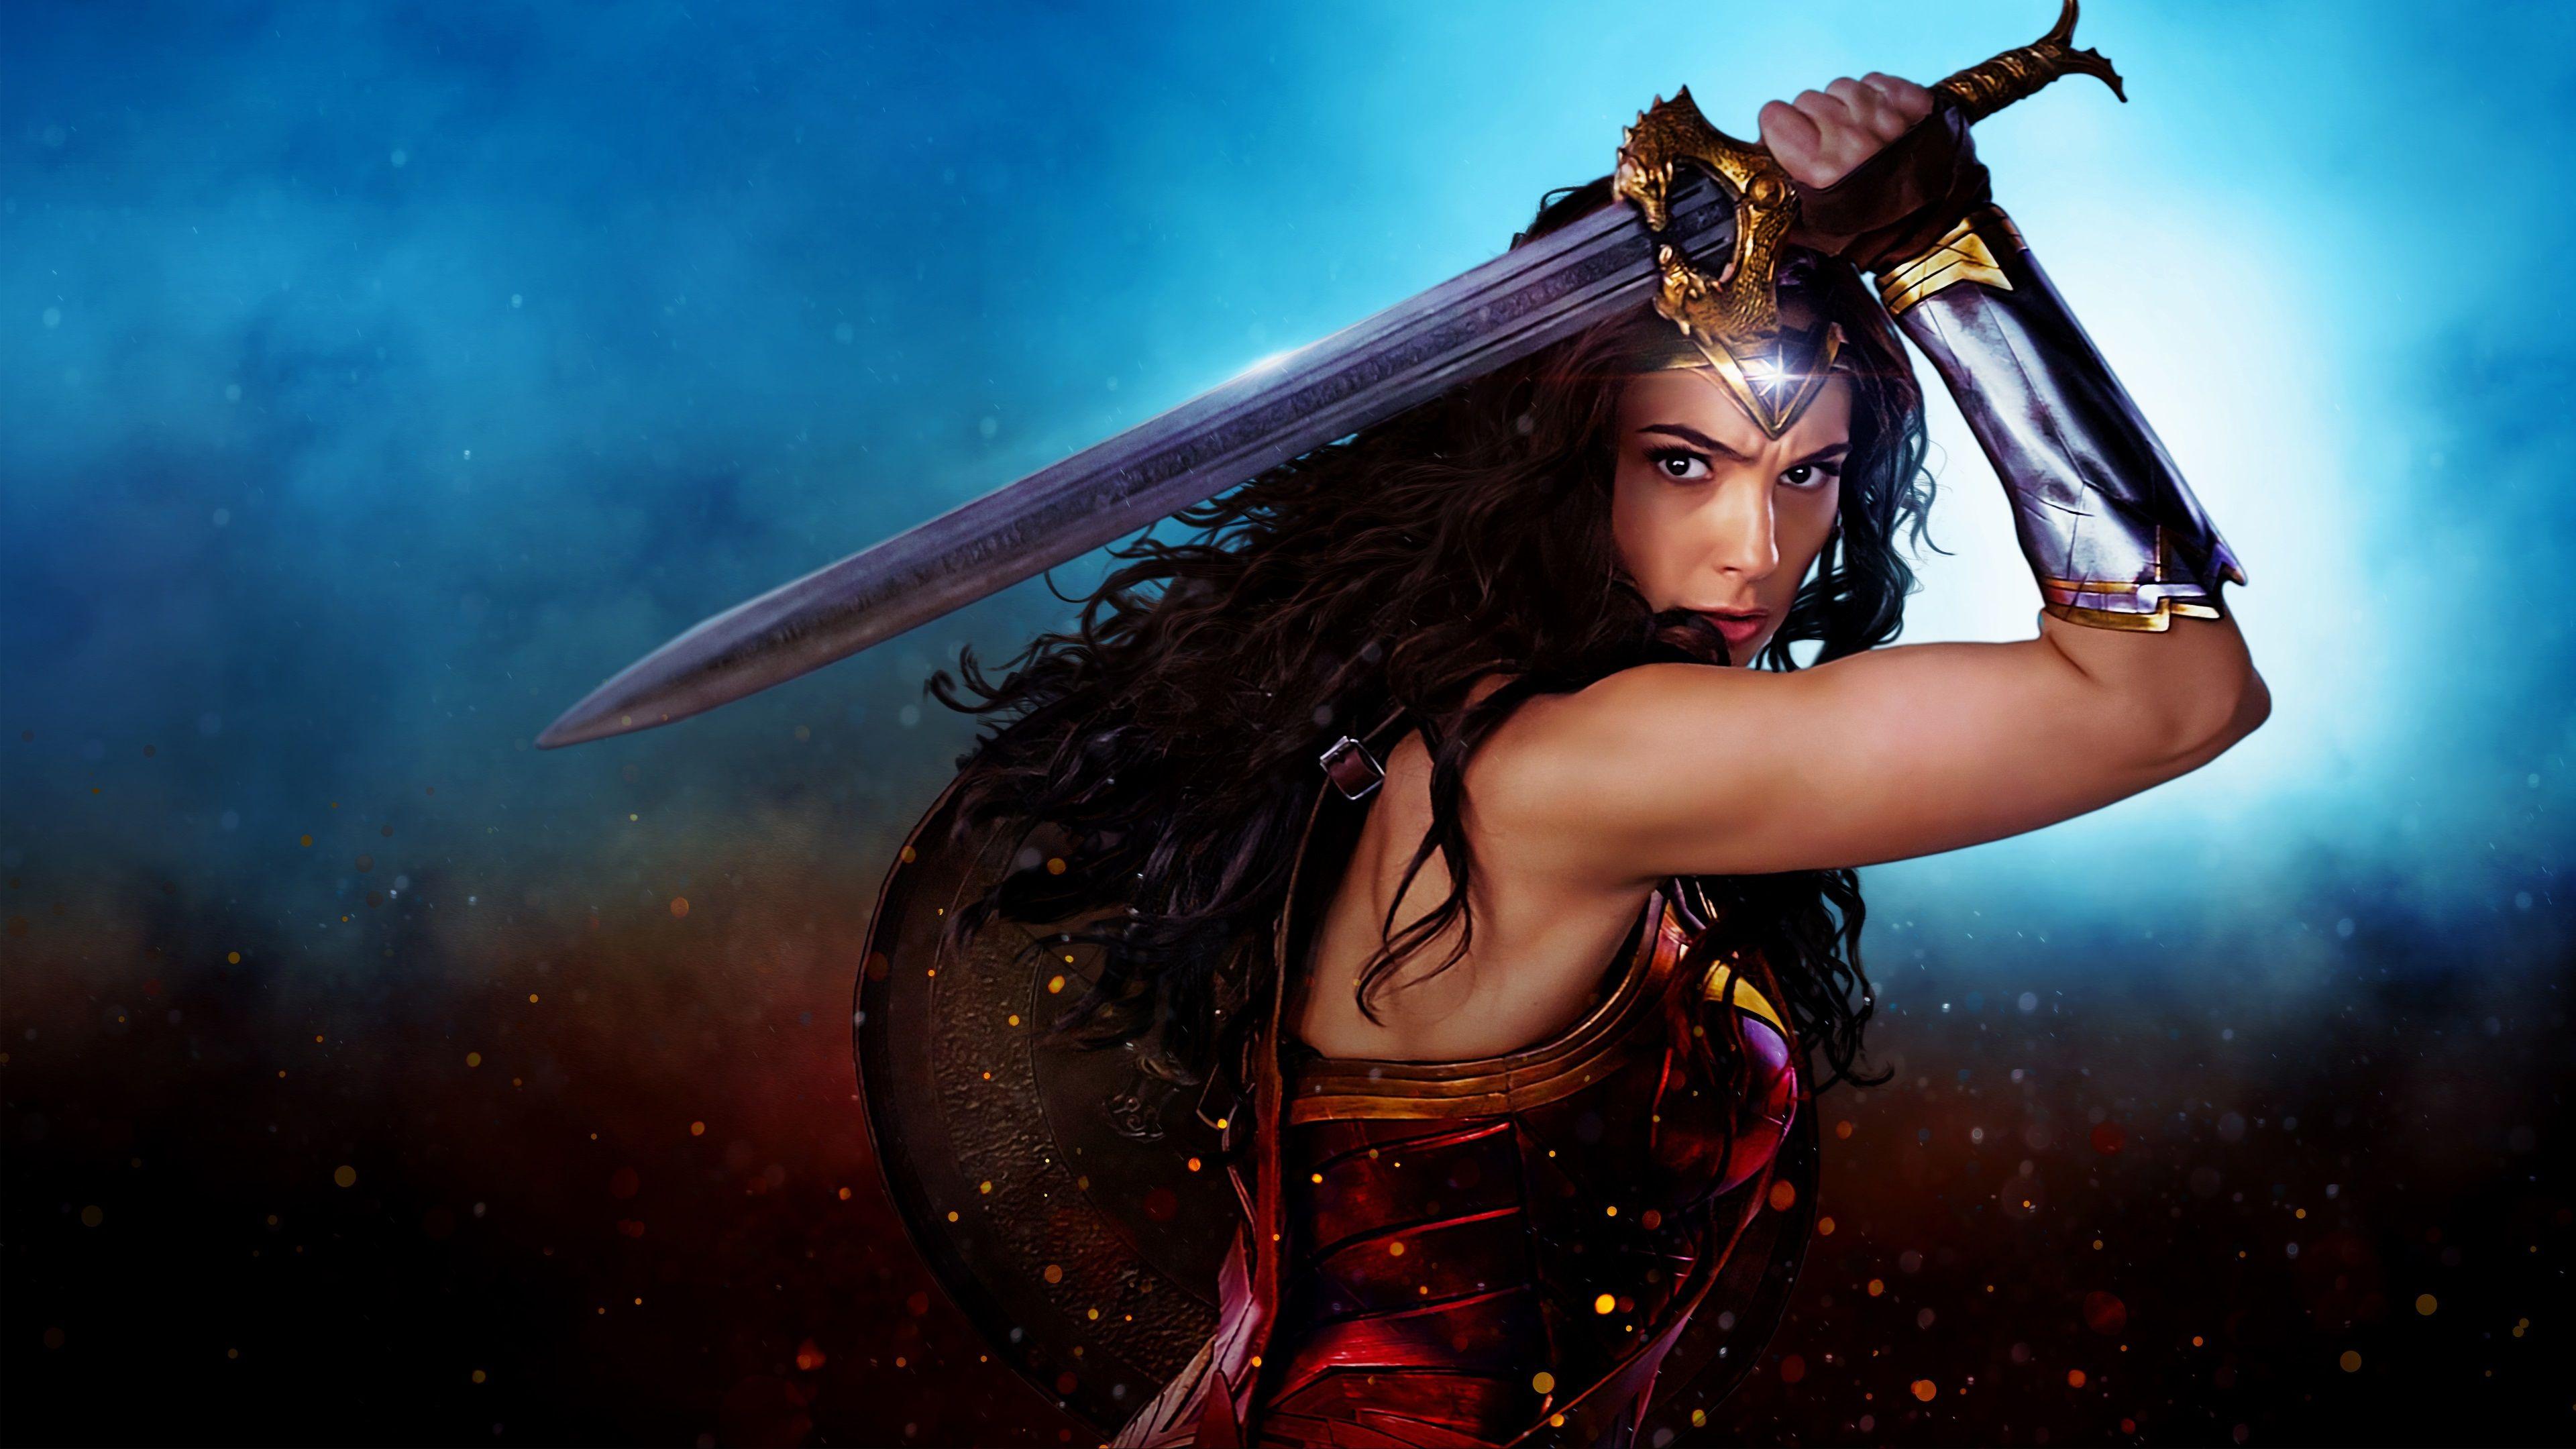 Wallpaper Wonder Woman 4k Movies 11307: 3840x2160 Wonder Woman 4k Desktop Wallpaper High